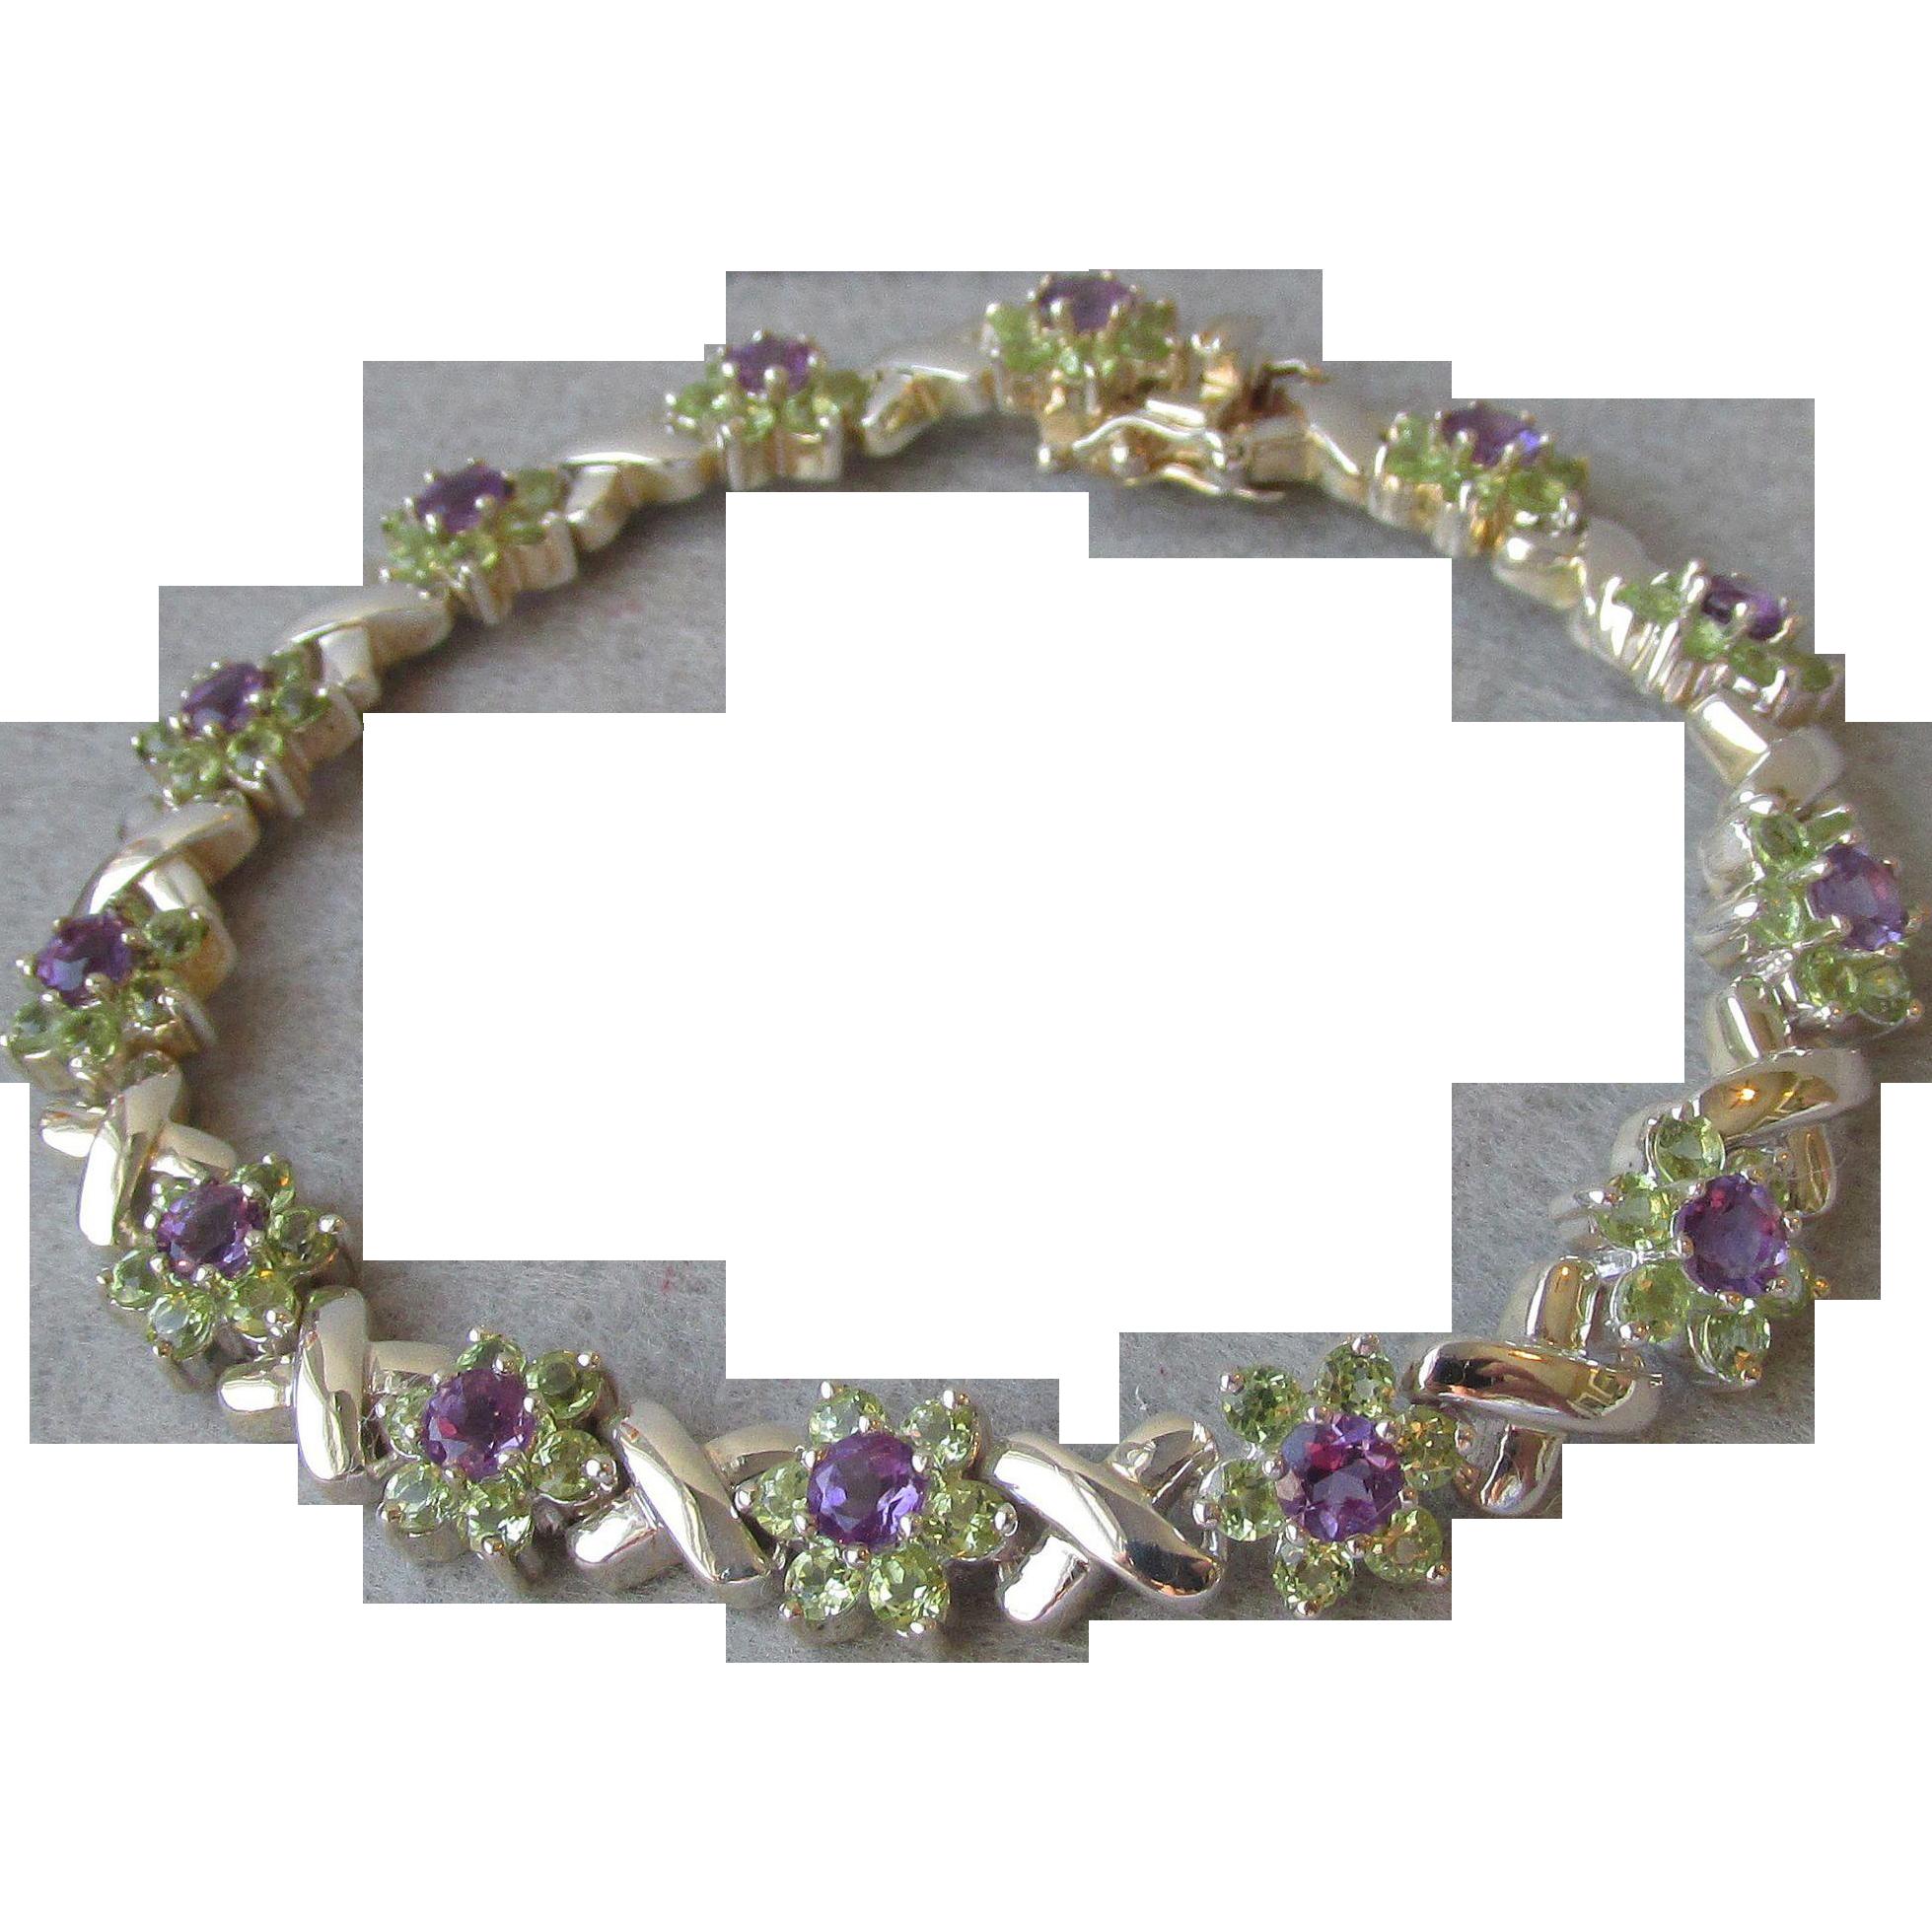 "Vintage 1980's Peridot & Amethyst Sterling Silver Flowers & Kisses Bracelet, Size Large 8"""